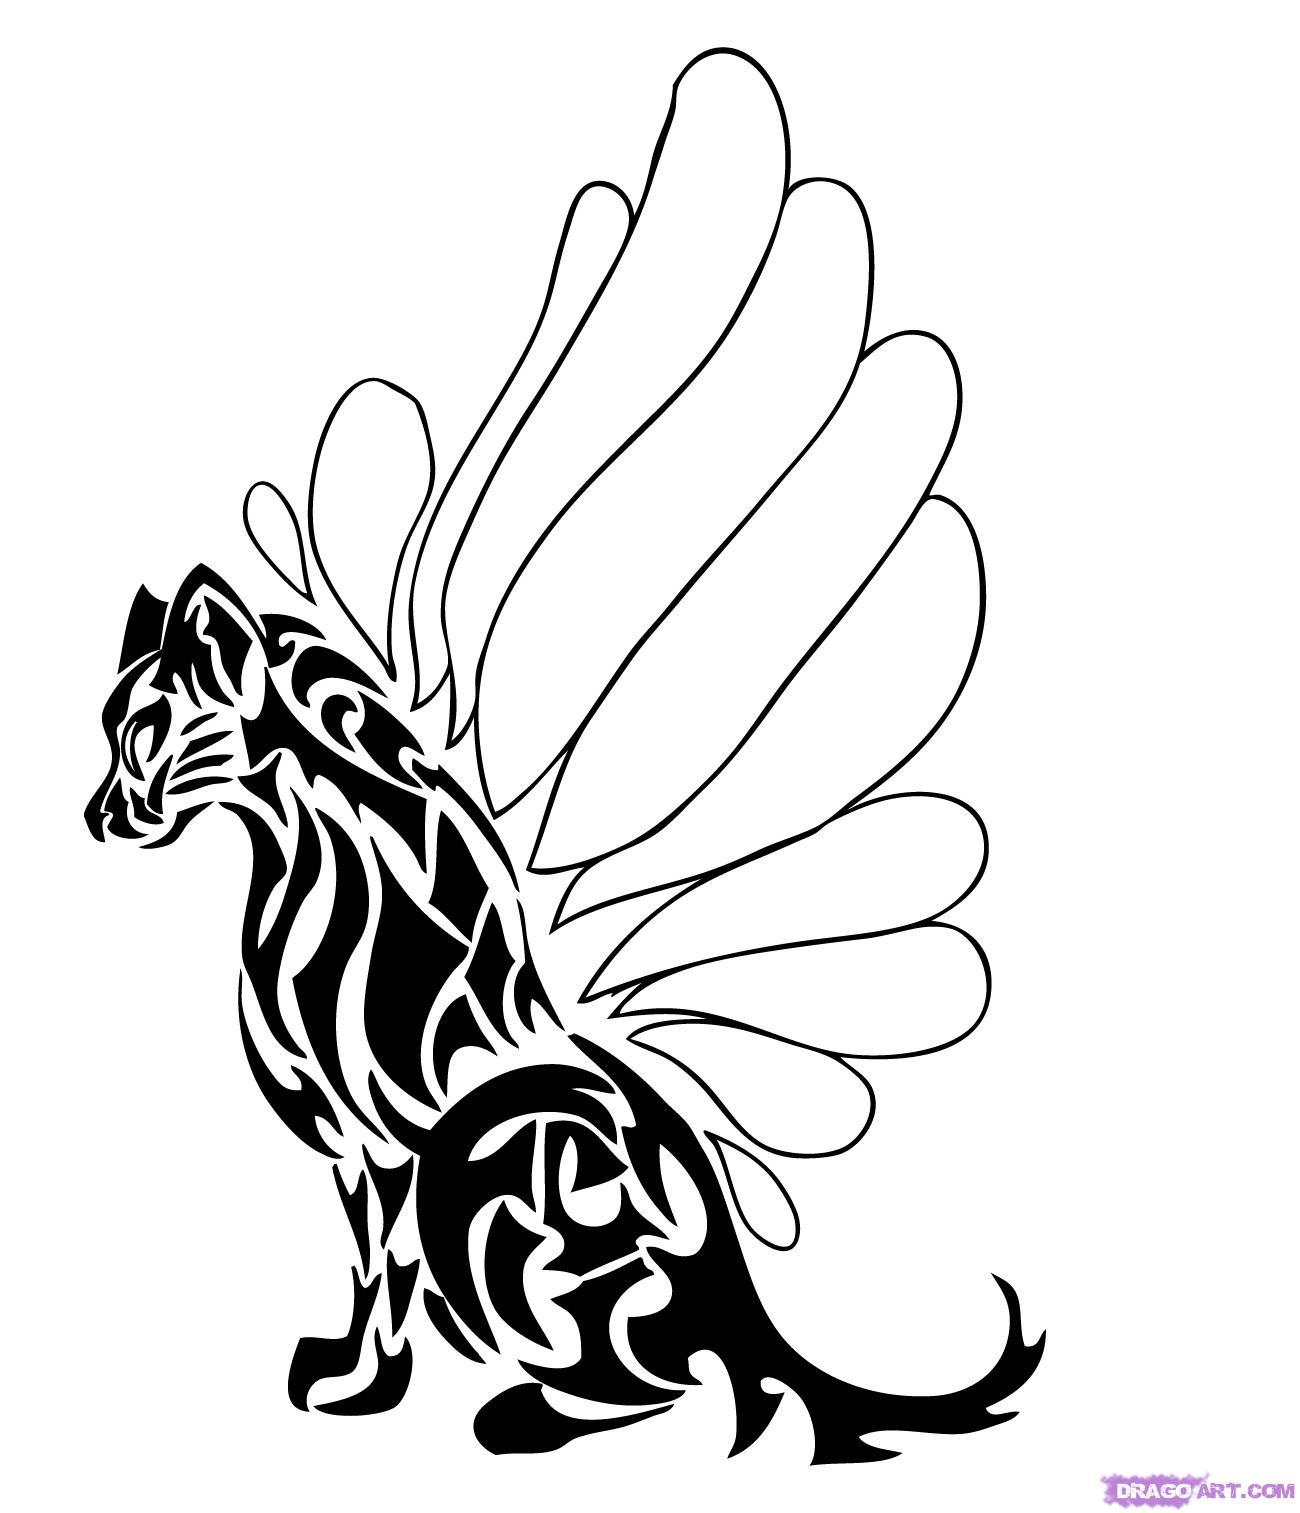 1300x1513 Cartoon Animal Drawings Easy How To Draw Tribal Animals Art Step